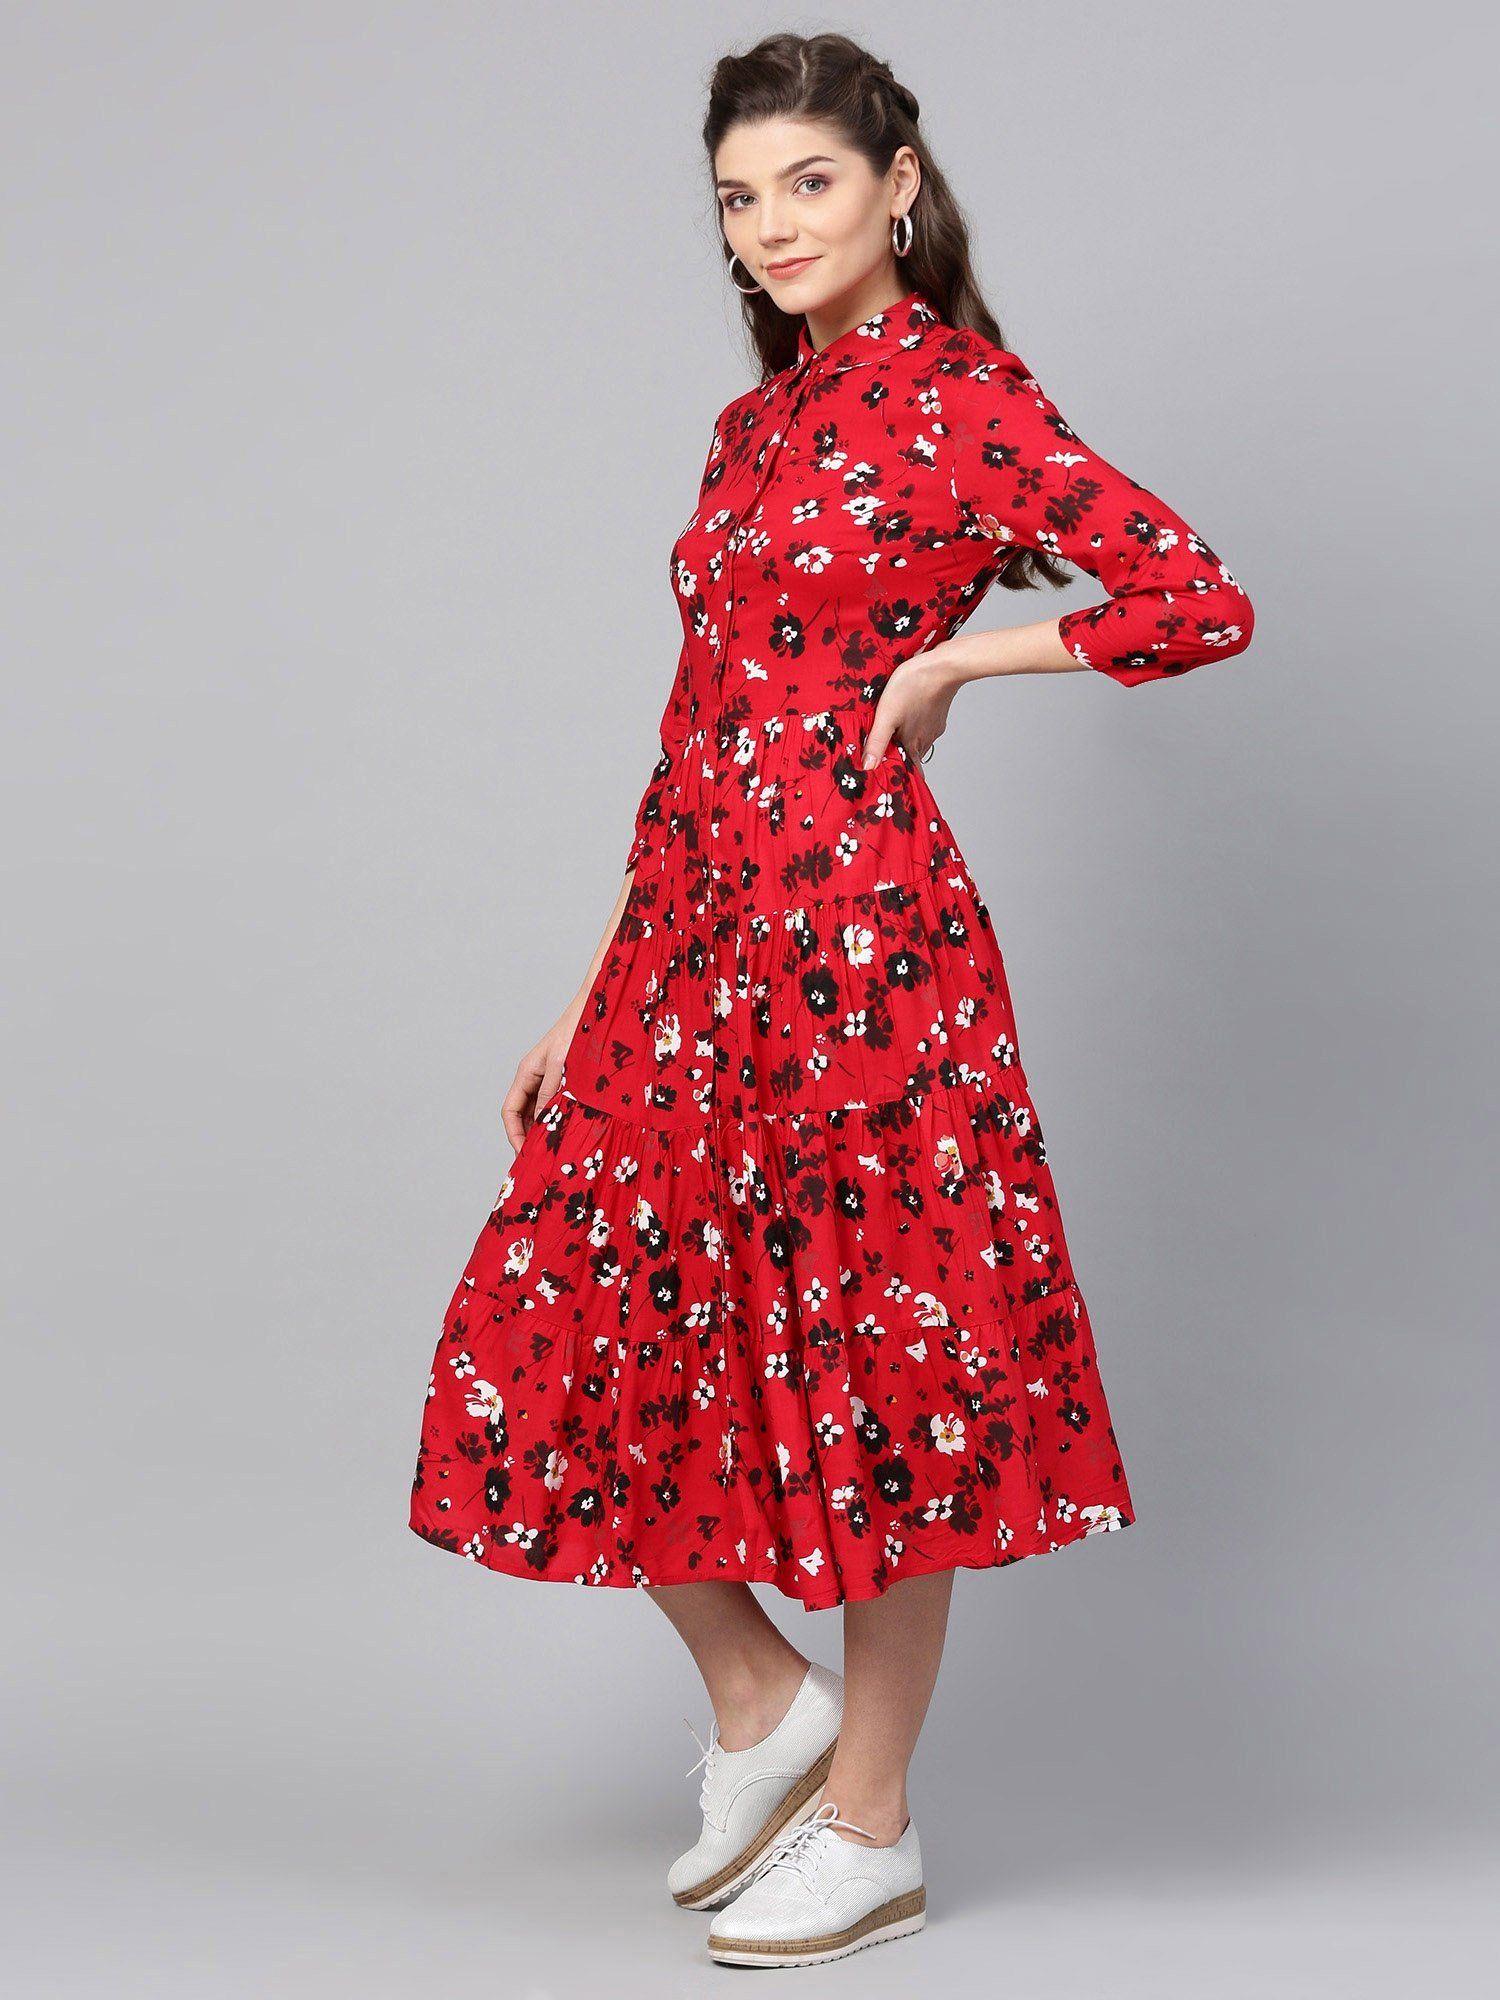 ea09795c38480 Femella Dresses : Buy Femella Red Floral Print Tier Shirt Dress ...